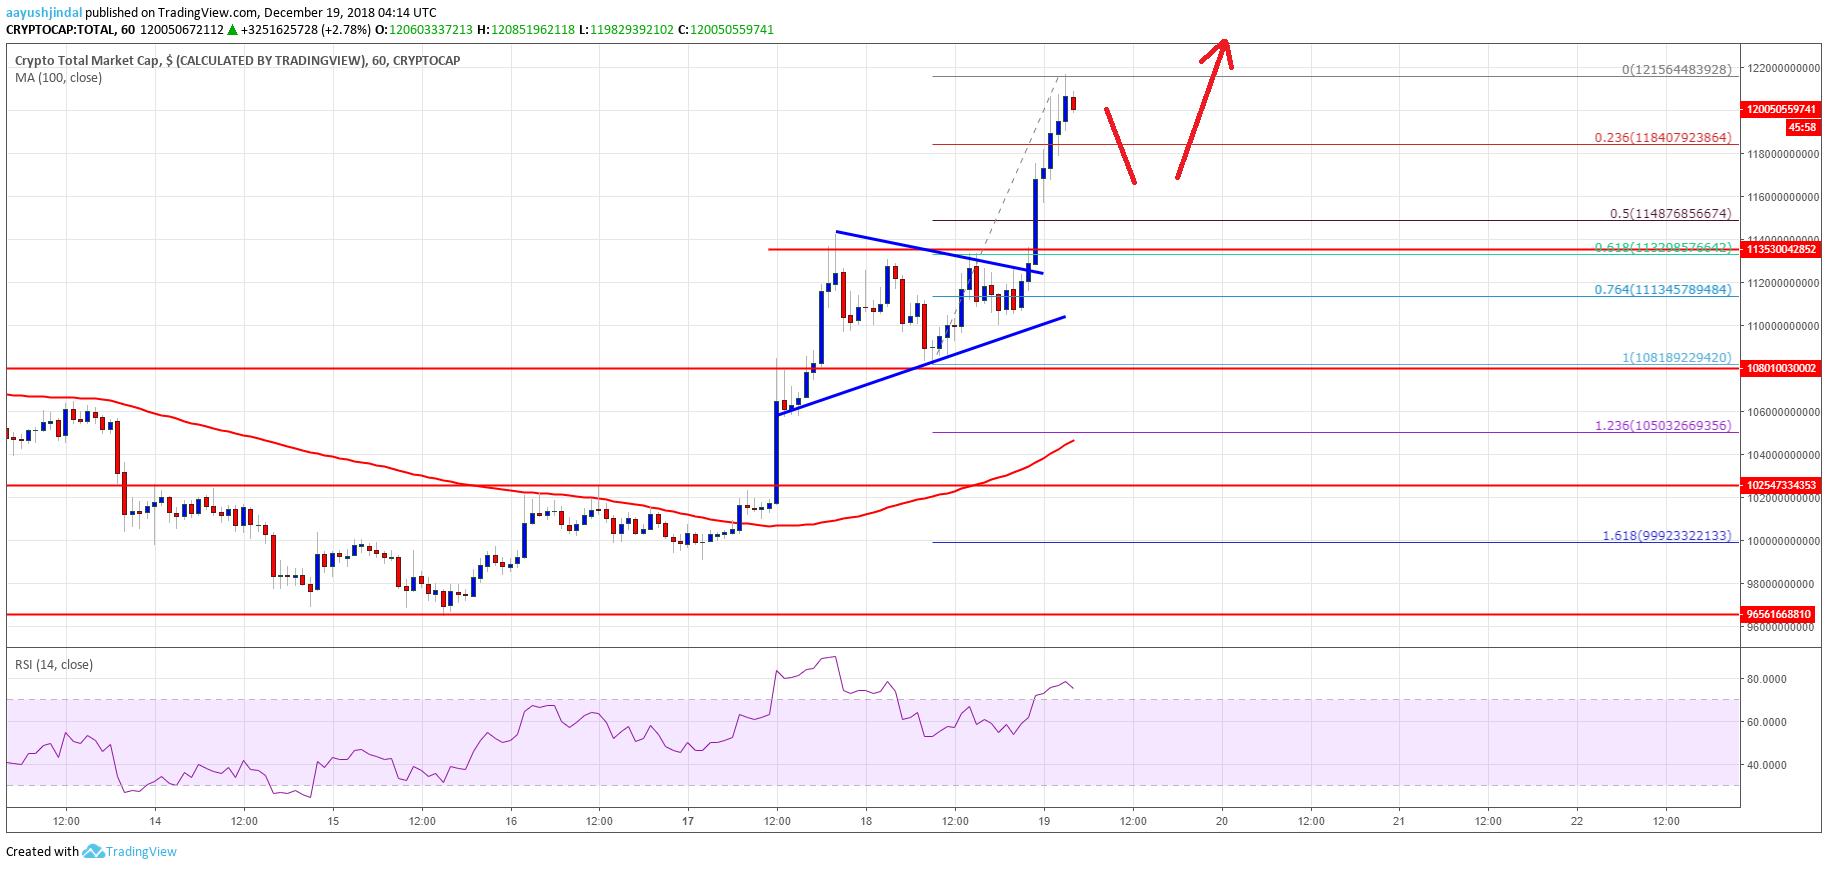 Crypto Market Cap Total LTC EOS BCH